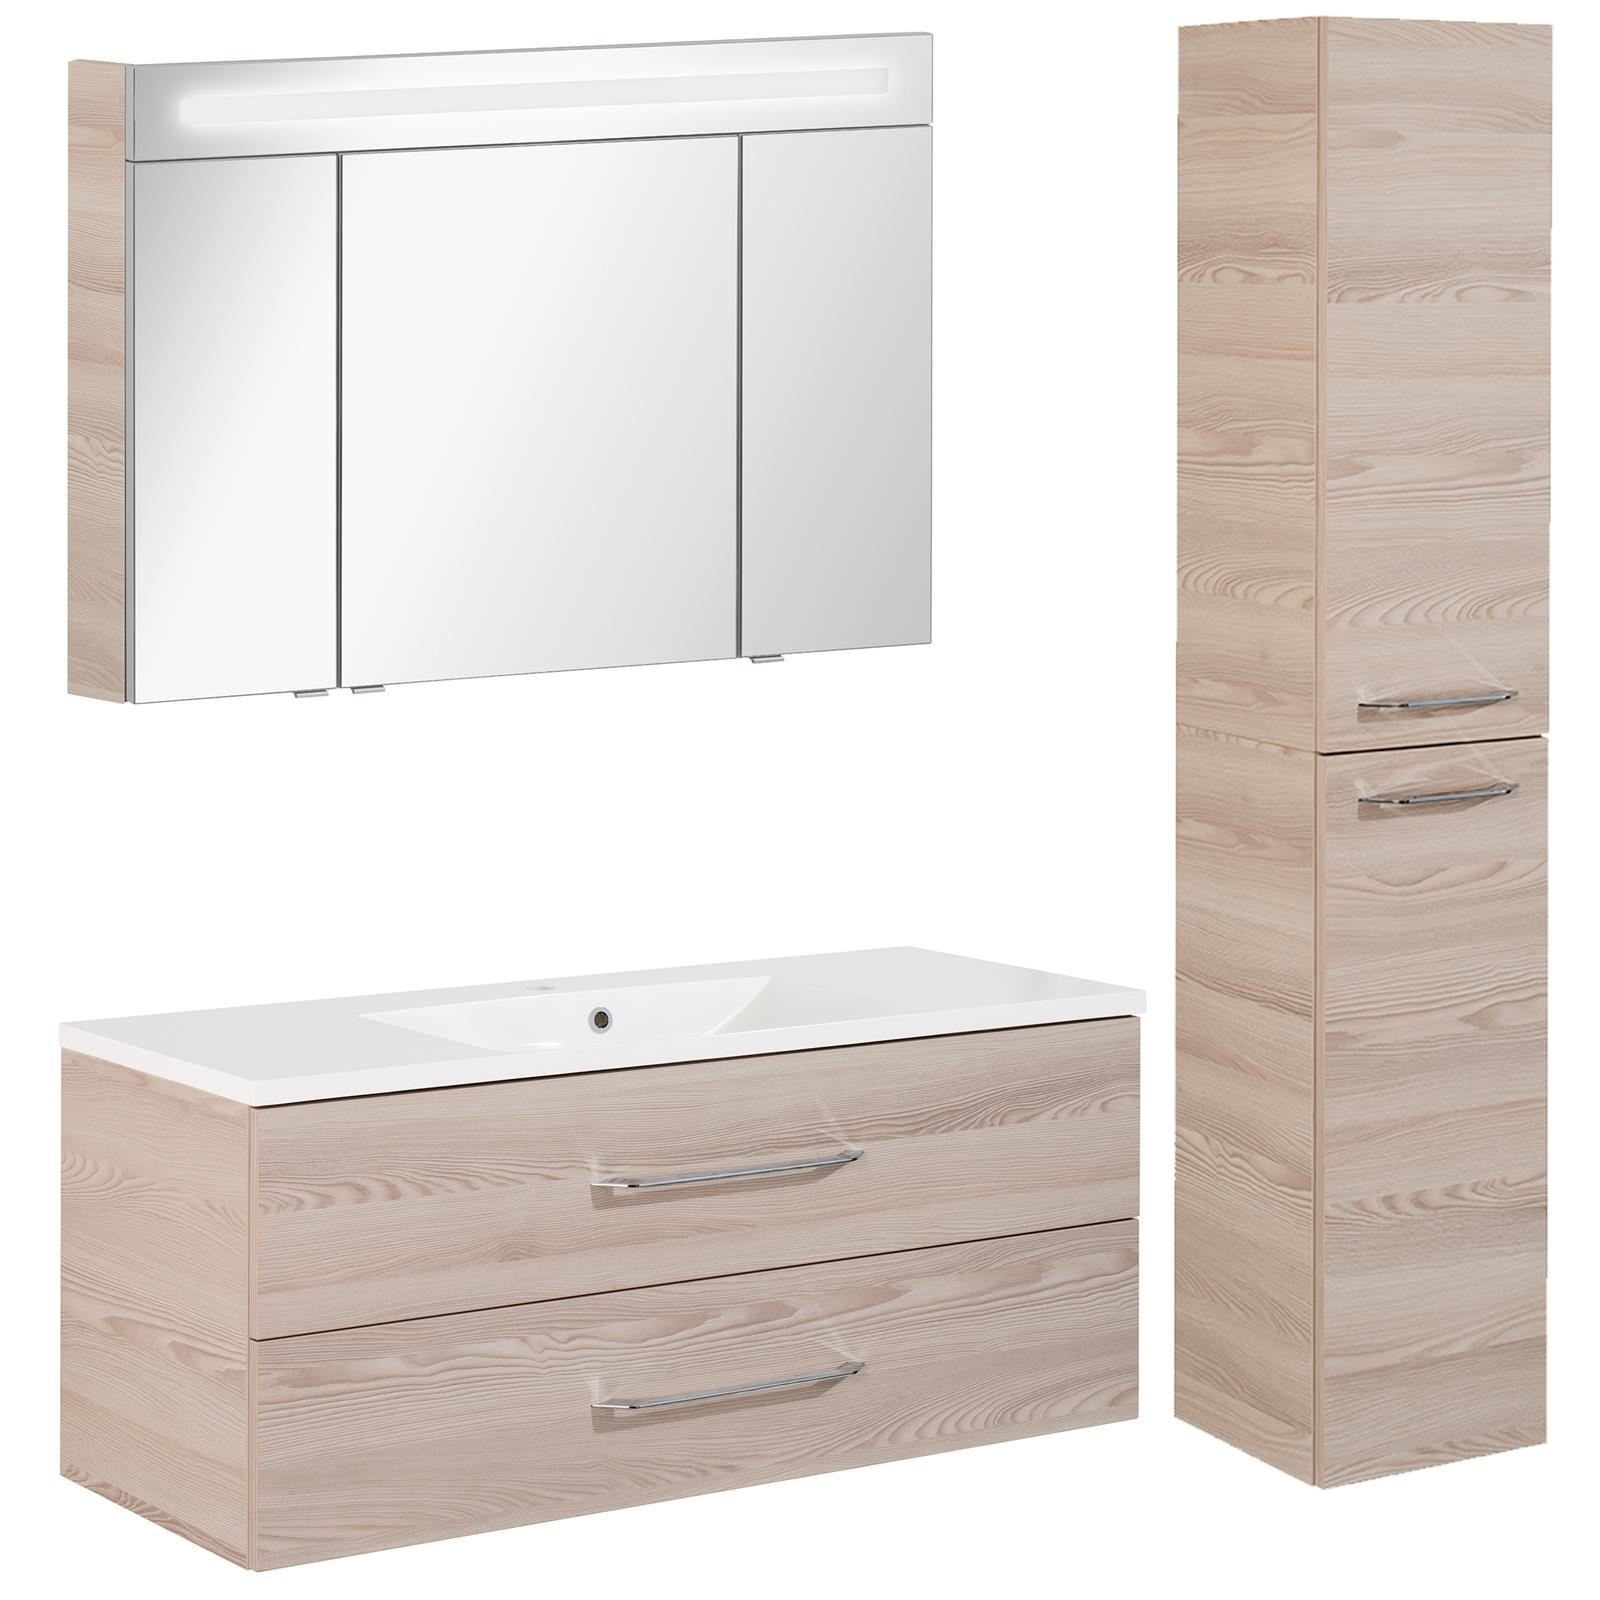 fackelmann badm bel set b clever 3 tlg 120 150 cm esche inkl hochschrank mm comsale. Black Bedroom Furniture Sets. Home Design Ideas